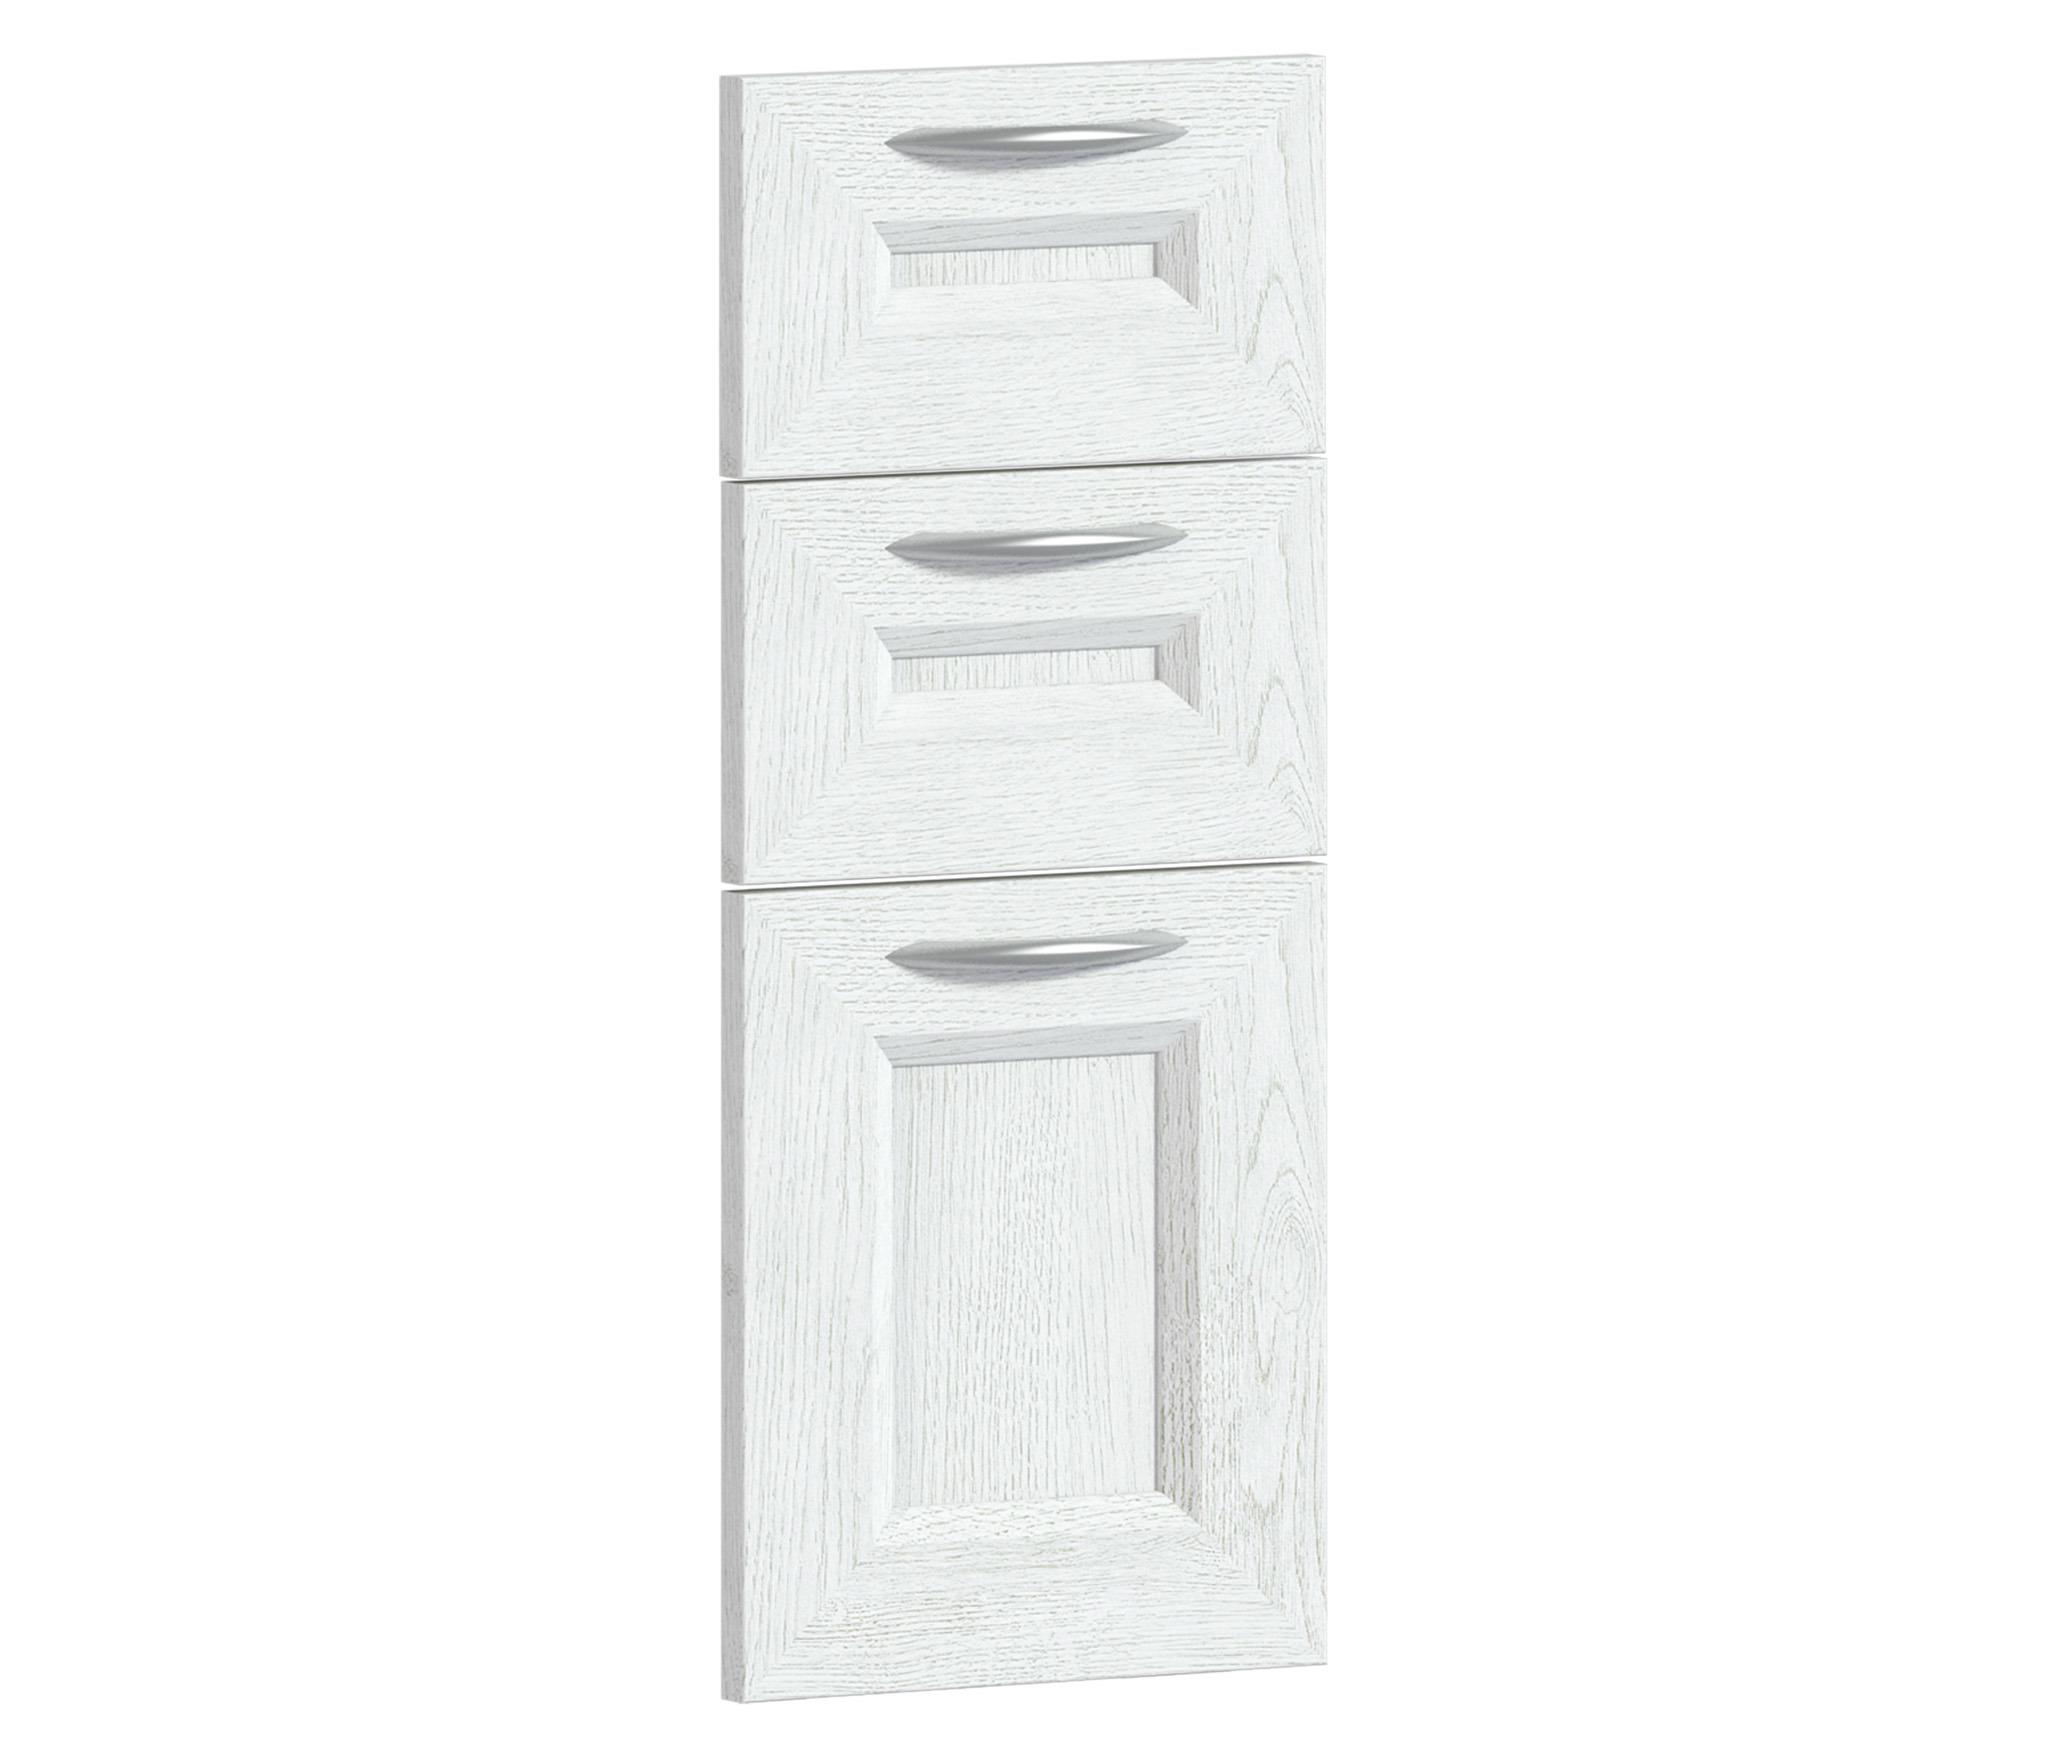 Фасад Регина Н-30Мебель для кухни<br><br><br>Длина мм: 296<br>Высота мм: 713<br>Глубина мм: 19